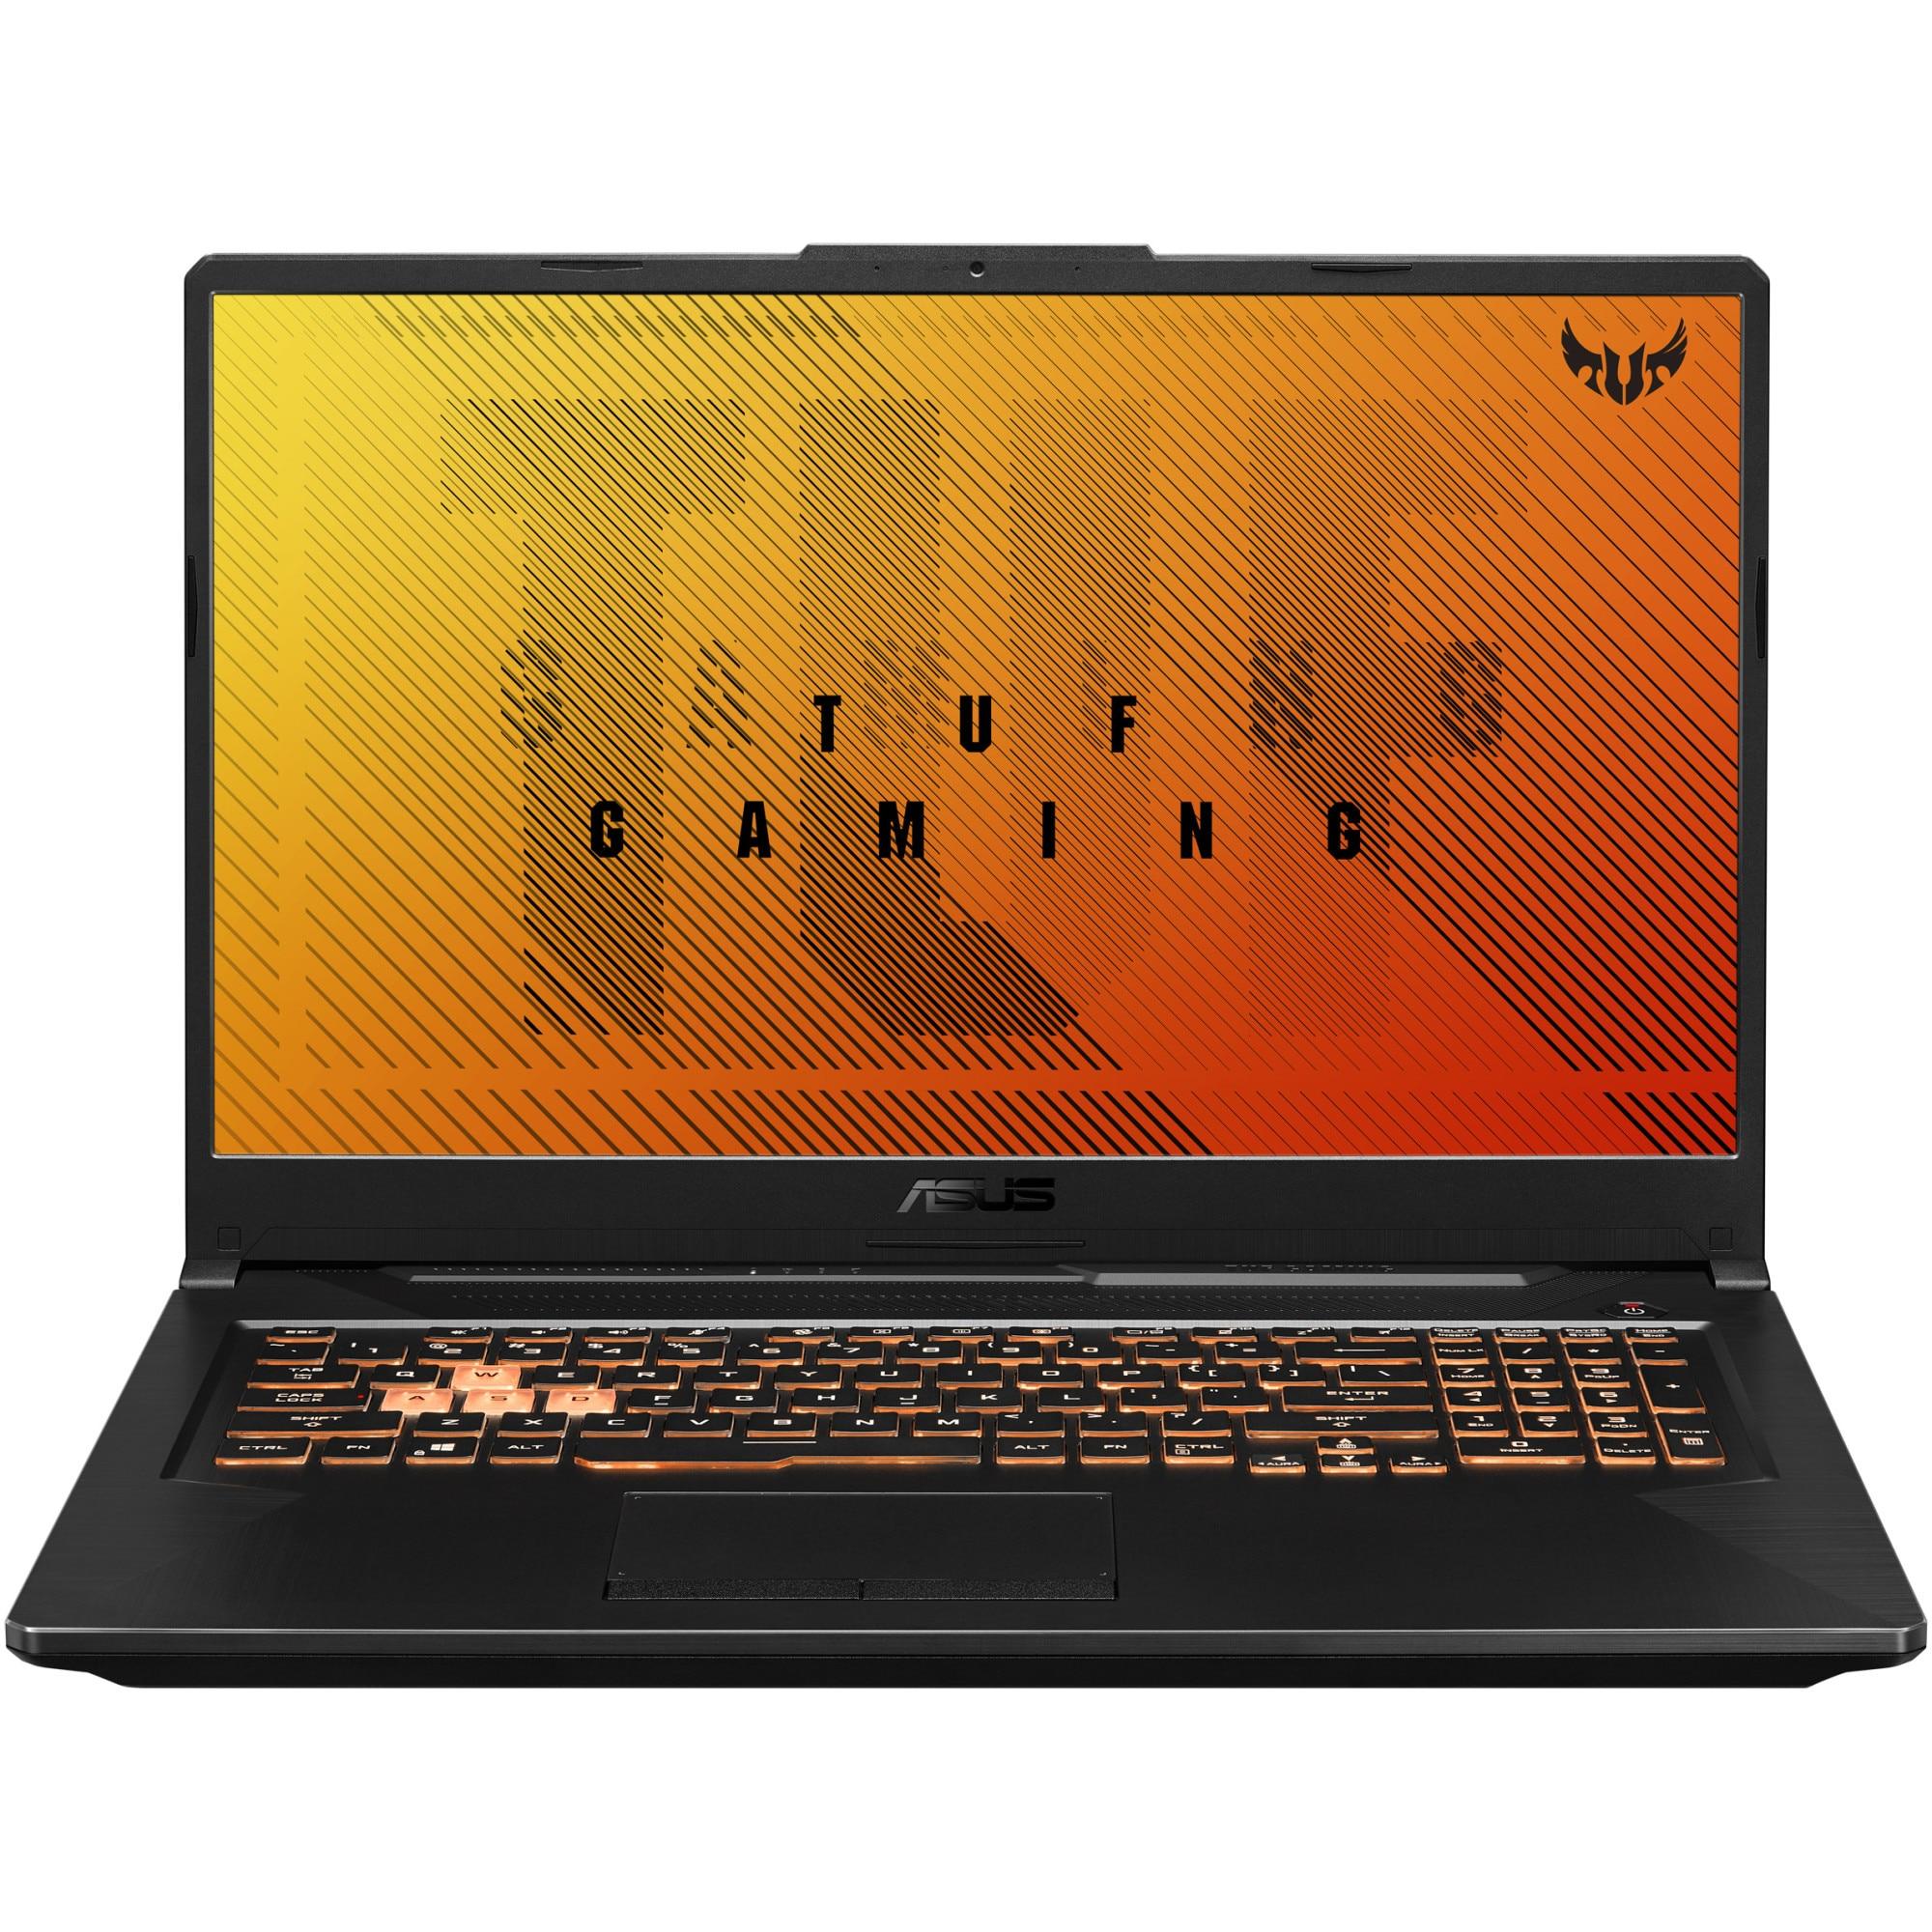 "Fotografie Laptop Gaming ASUS TUF A17 cu procesor AMD Ryzen™ 5 4600H pana la 4.00 GHz, 17.3"", Full HD, 120 Hz, 8GB, 1TB HDD + 256GB GD SSD, NVIDIA® GeForce® GTX 1650 Ti 4GB, Free DOS, Black"